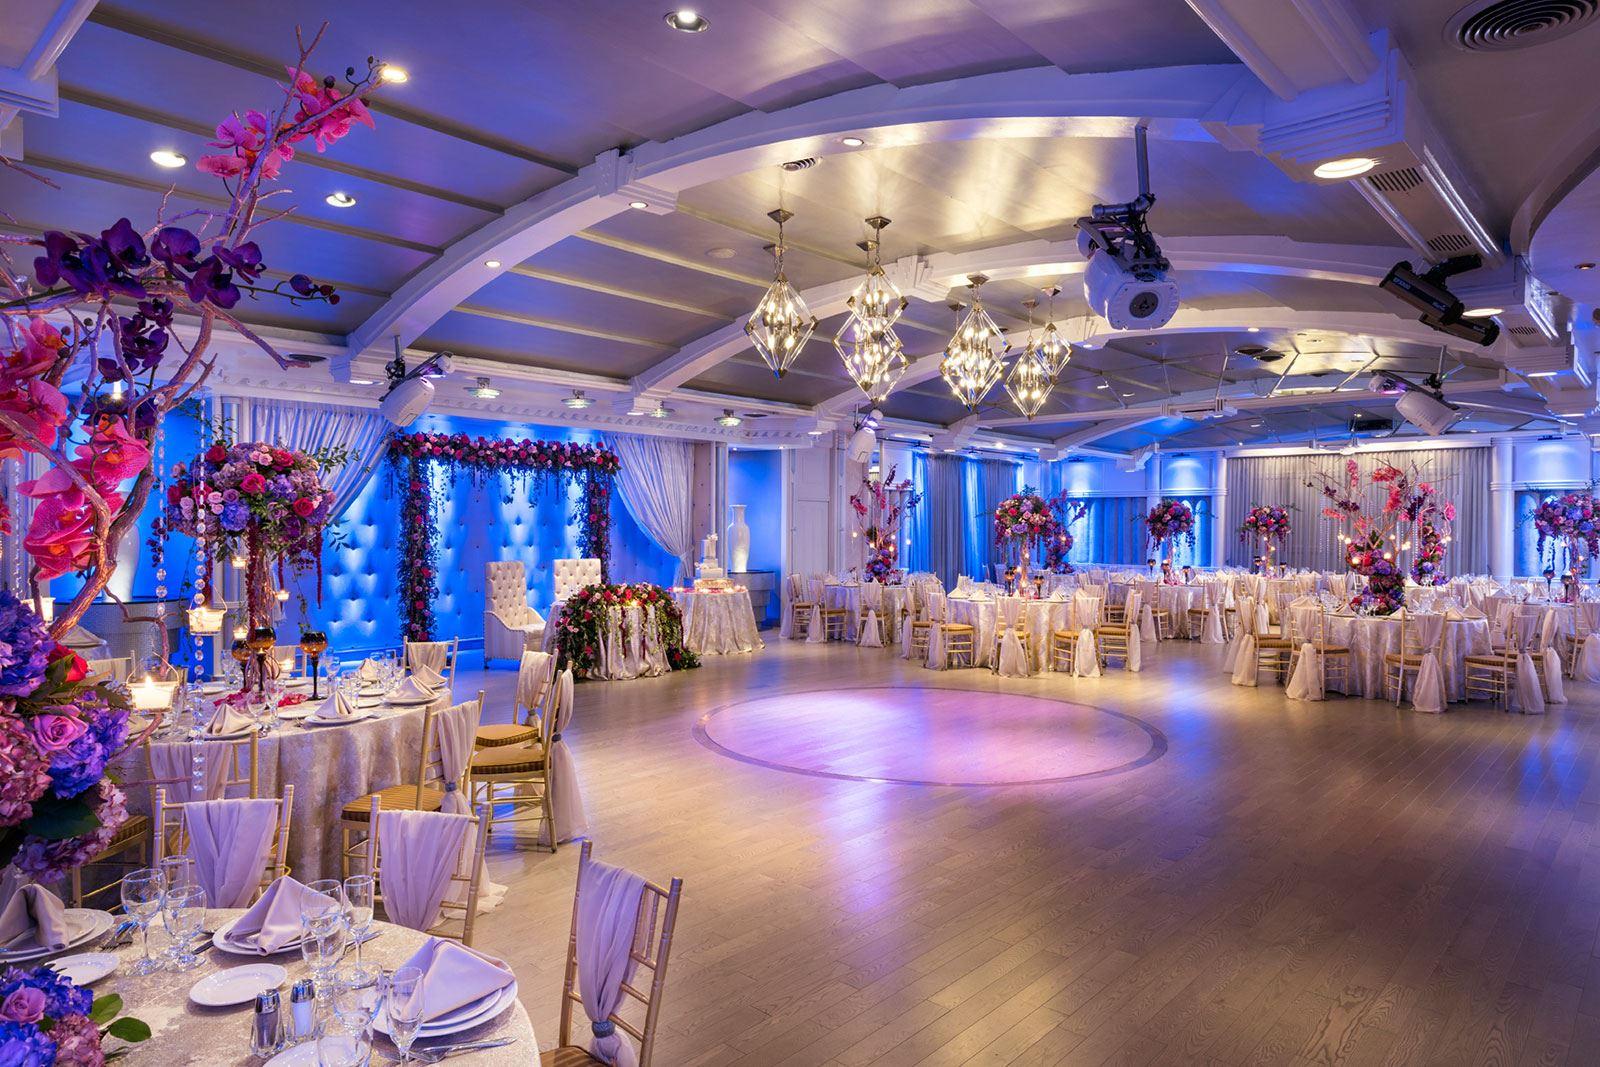 Normandy Ballroom Table Dance Floor